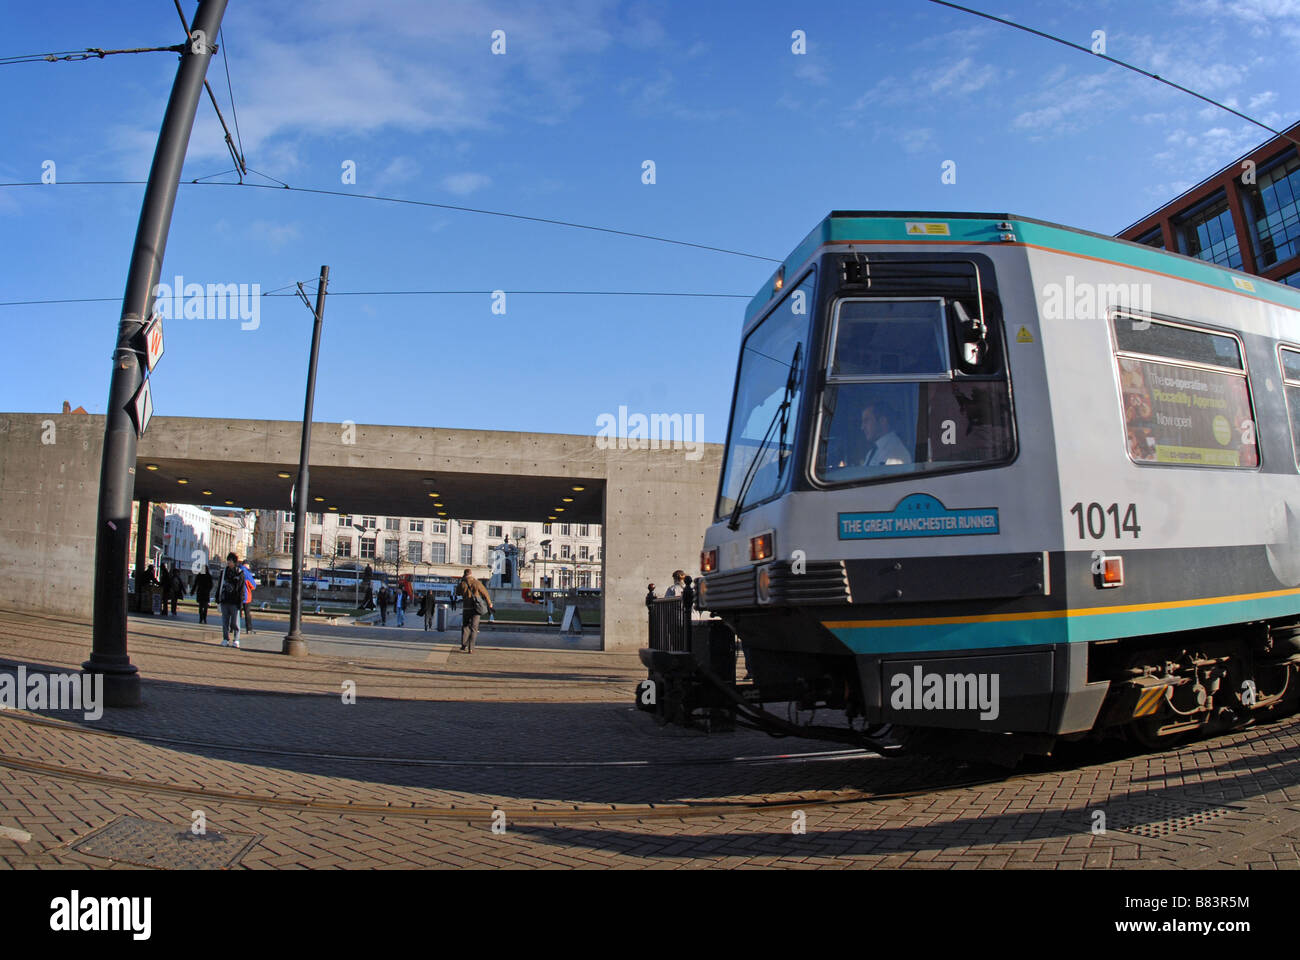 Metrolink, Manchester - Stock Image